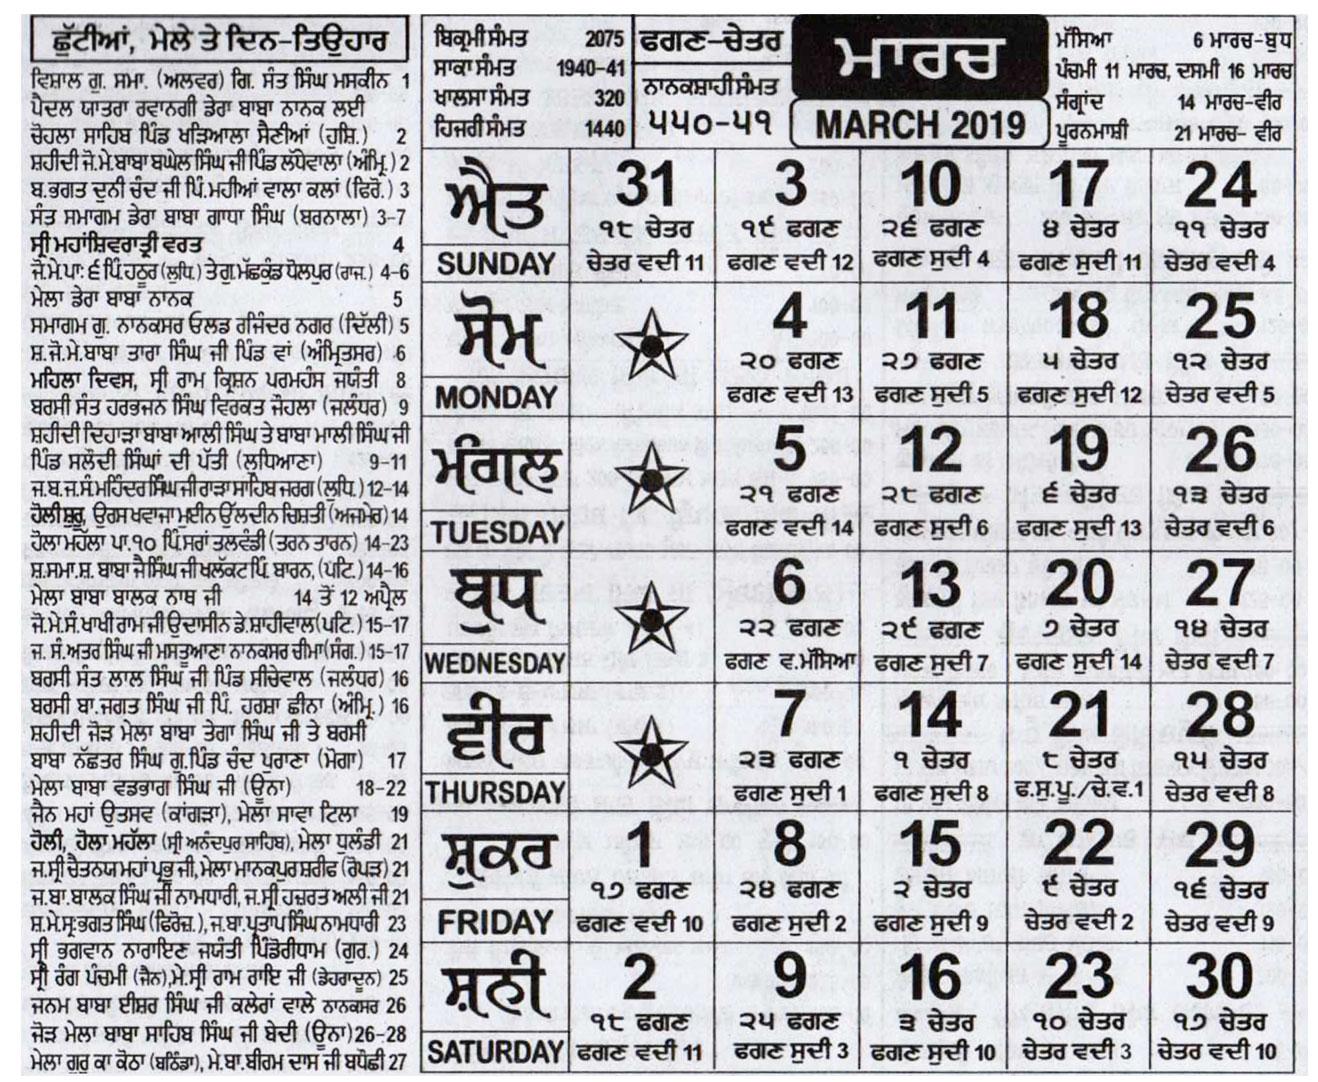 Khalsa Heera Jantri 2019  Nitnem Path with regard to Khalsa Heera Jantri 2020 Pdf Download